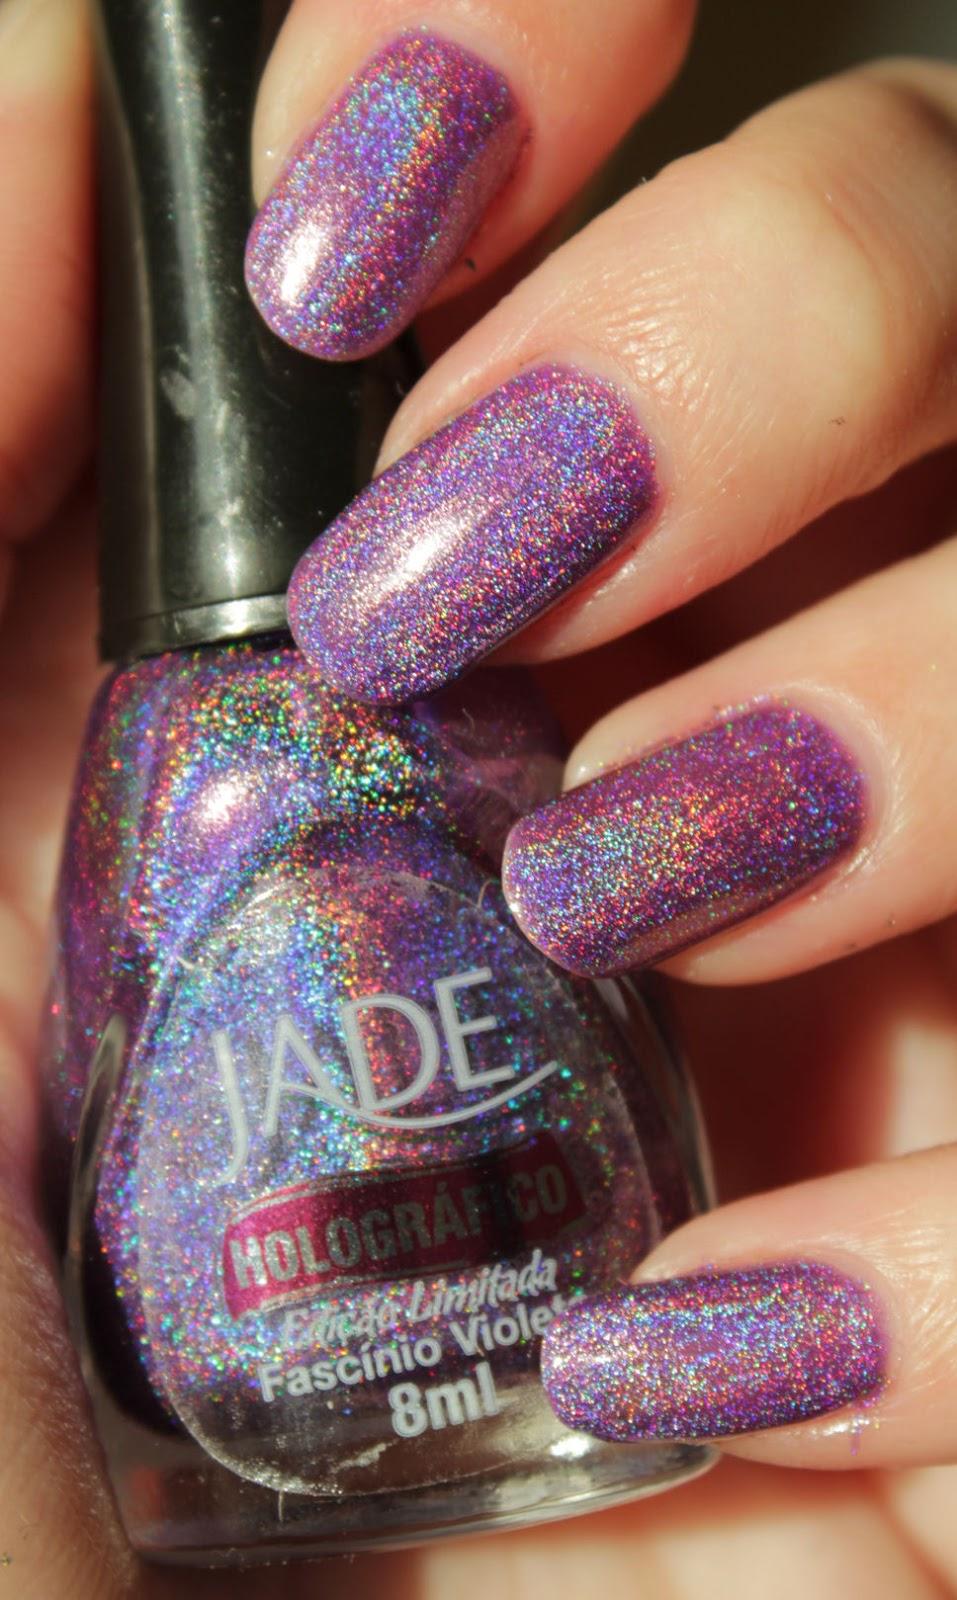 http://lacquediction.blogspot.de/2015/05/jade-holografico-fascinio-violeta.html